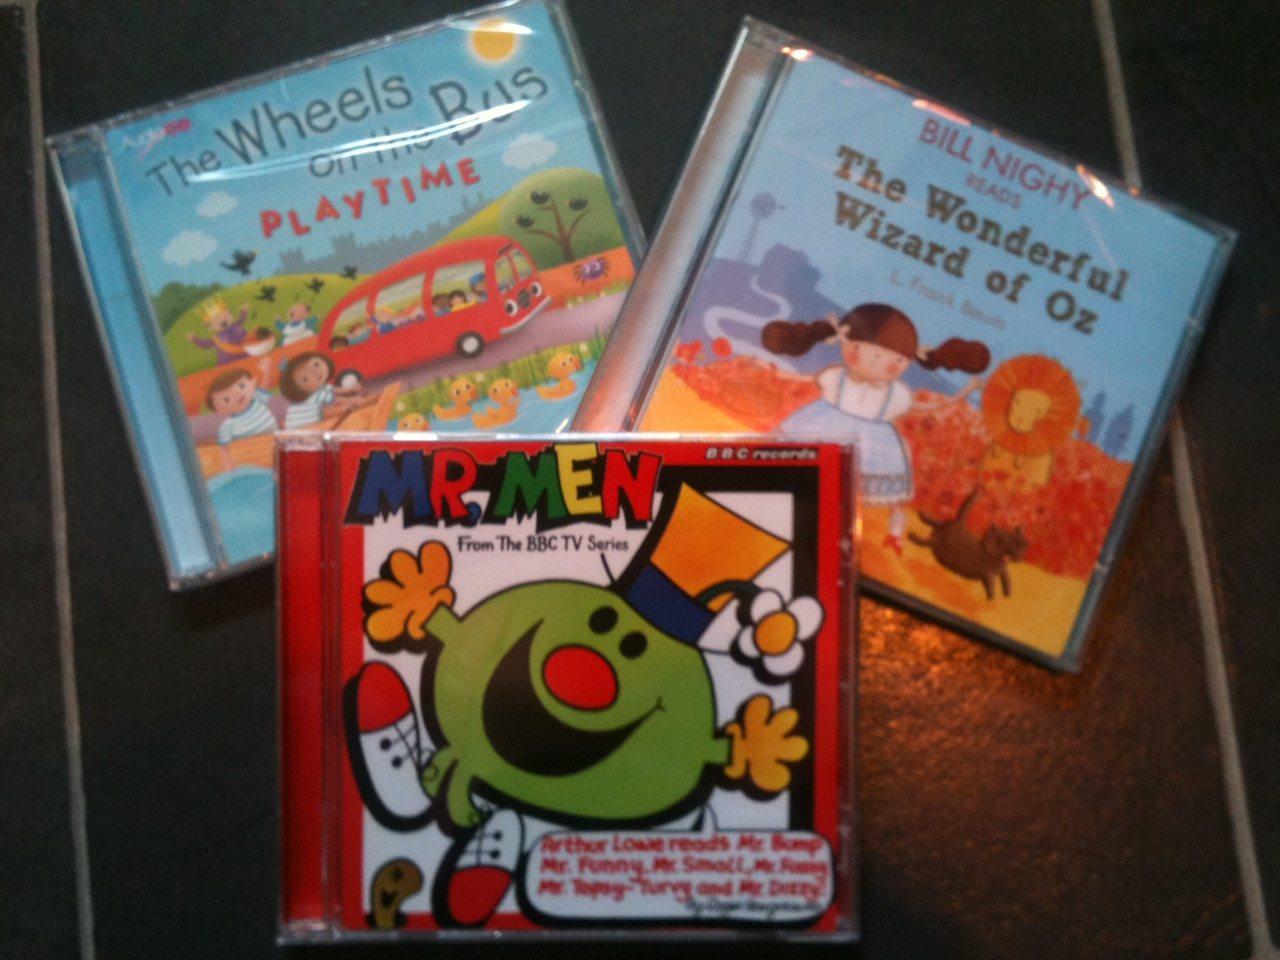 AudioGo: All three CDs